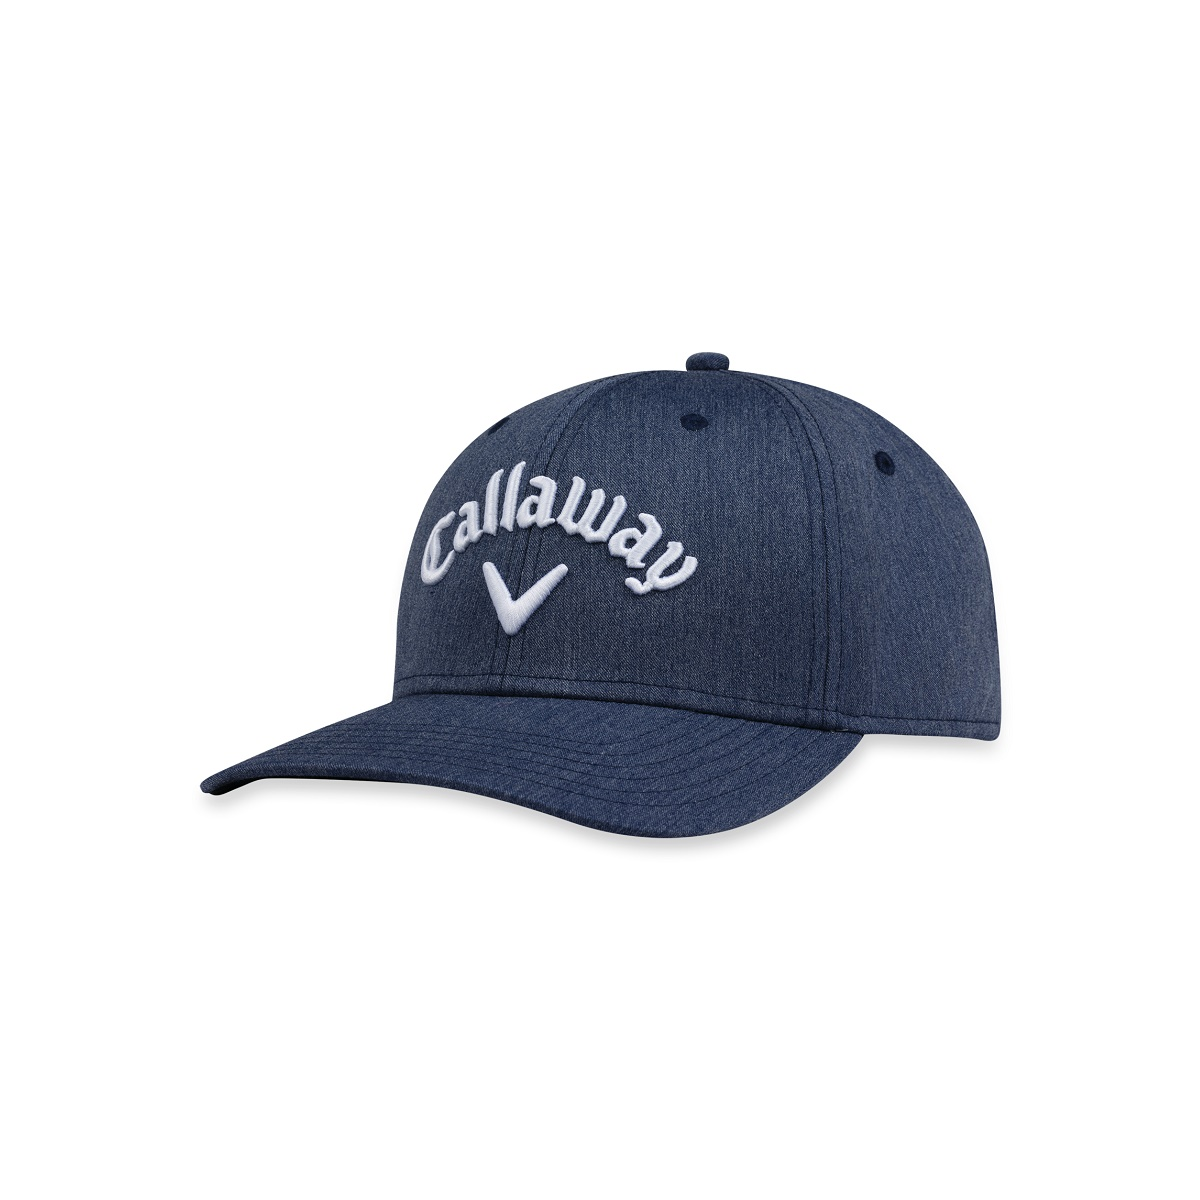 d545dc39 Shop Callaway 2018 High Crown Snapback Golf Hat | GLW